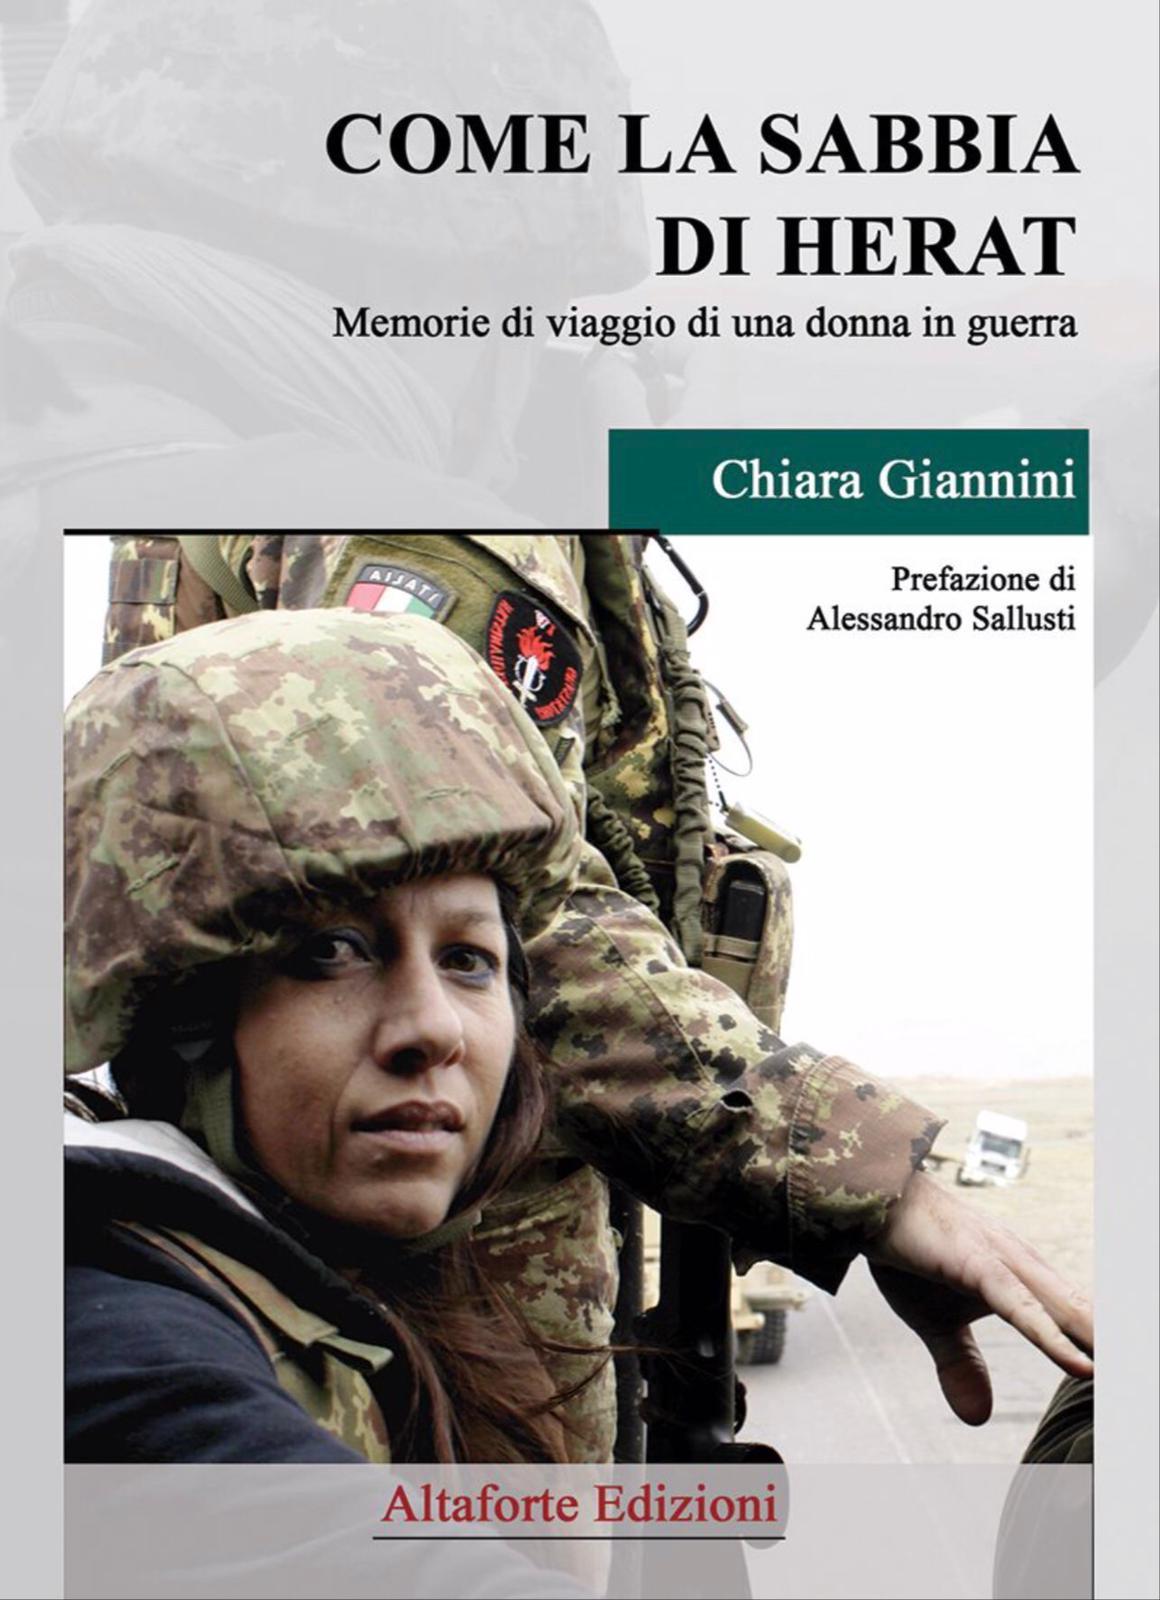 Chiara Giannini, libro